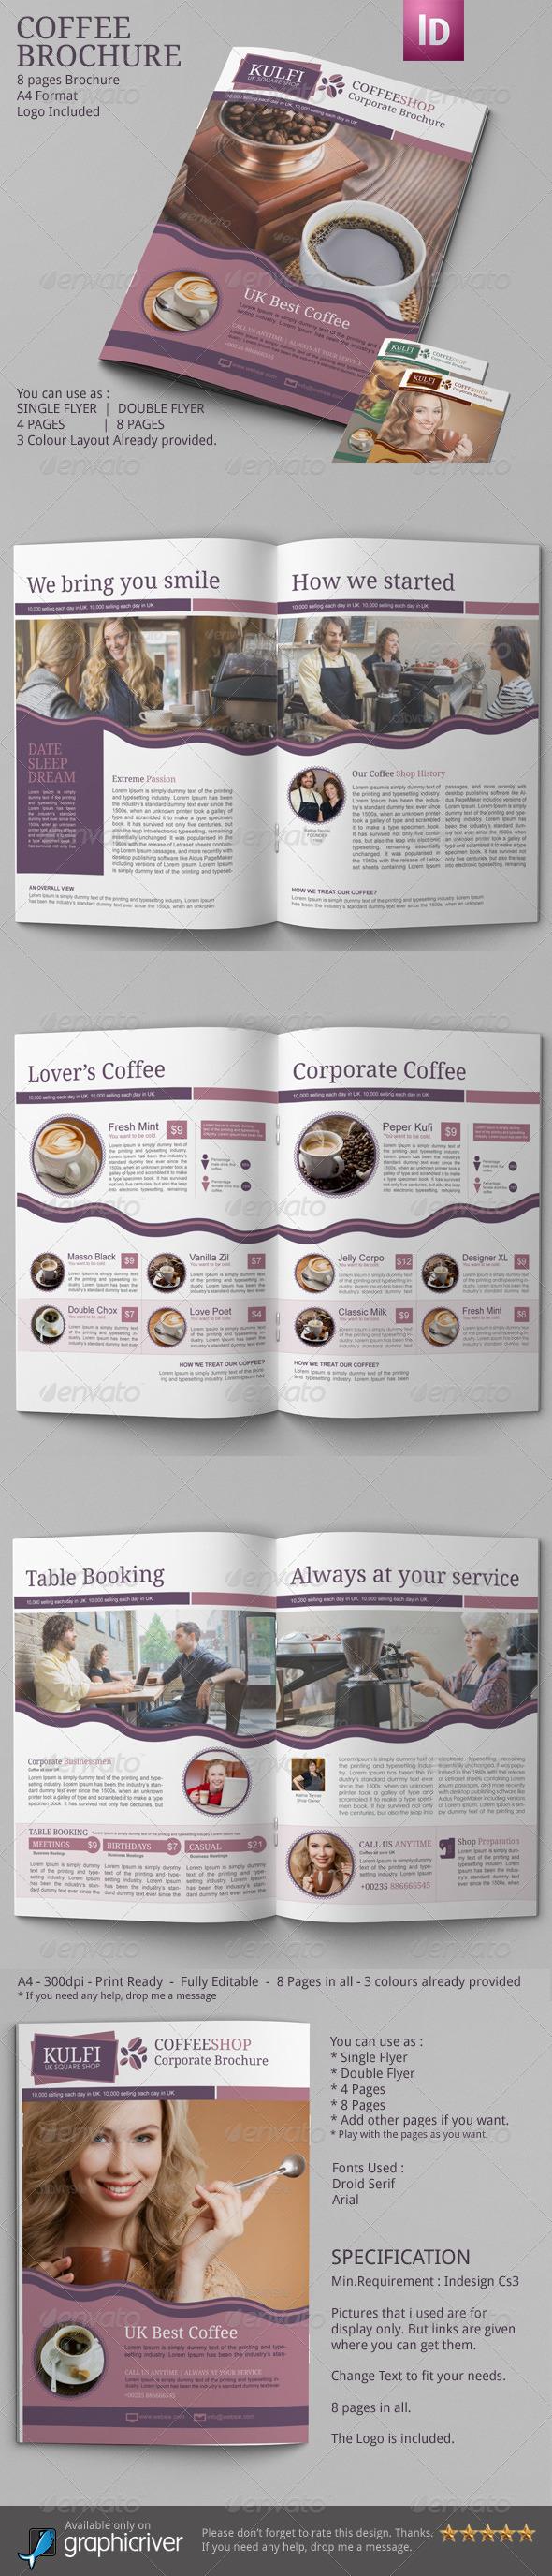 GraphicRiver Coffee Brochure Template A4 6899113